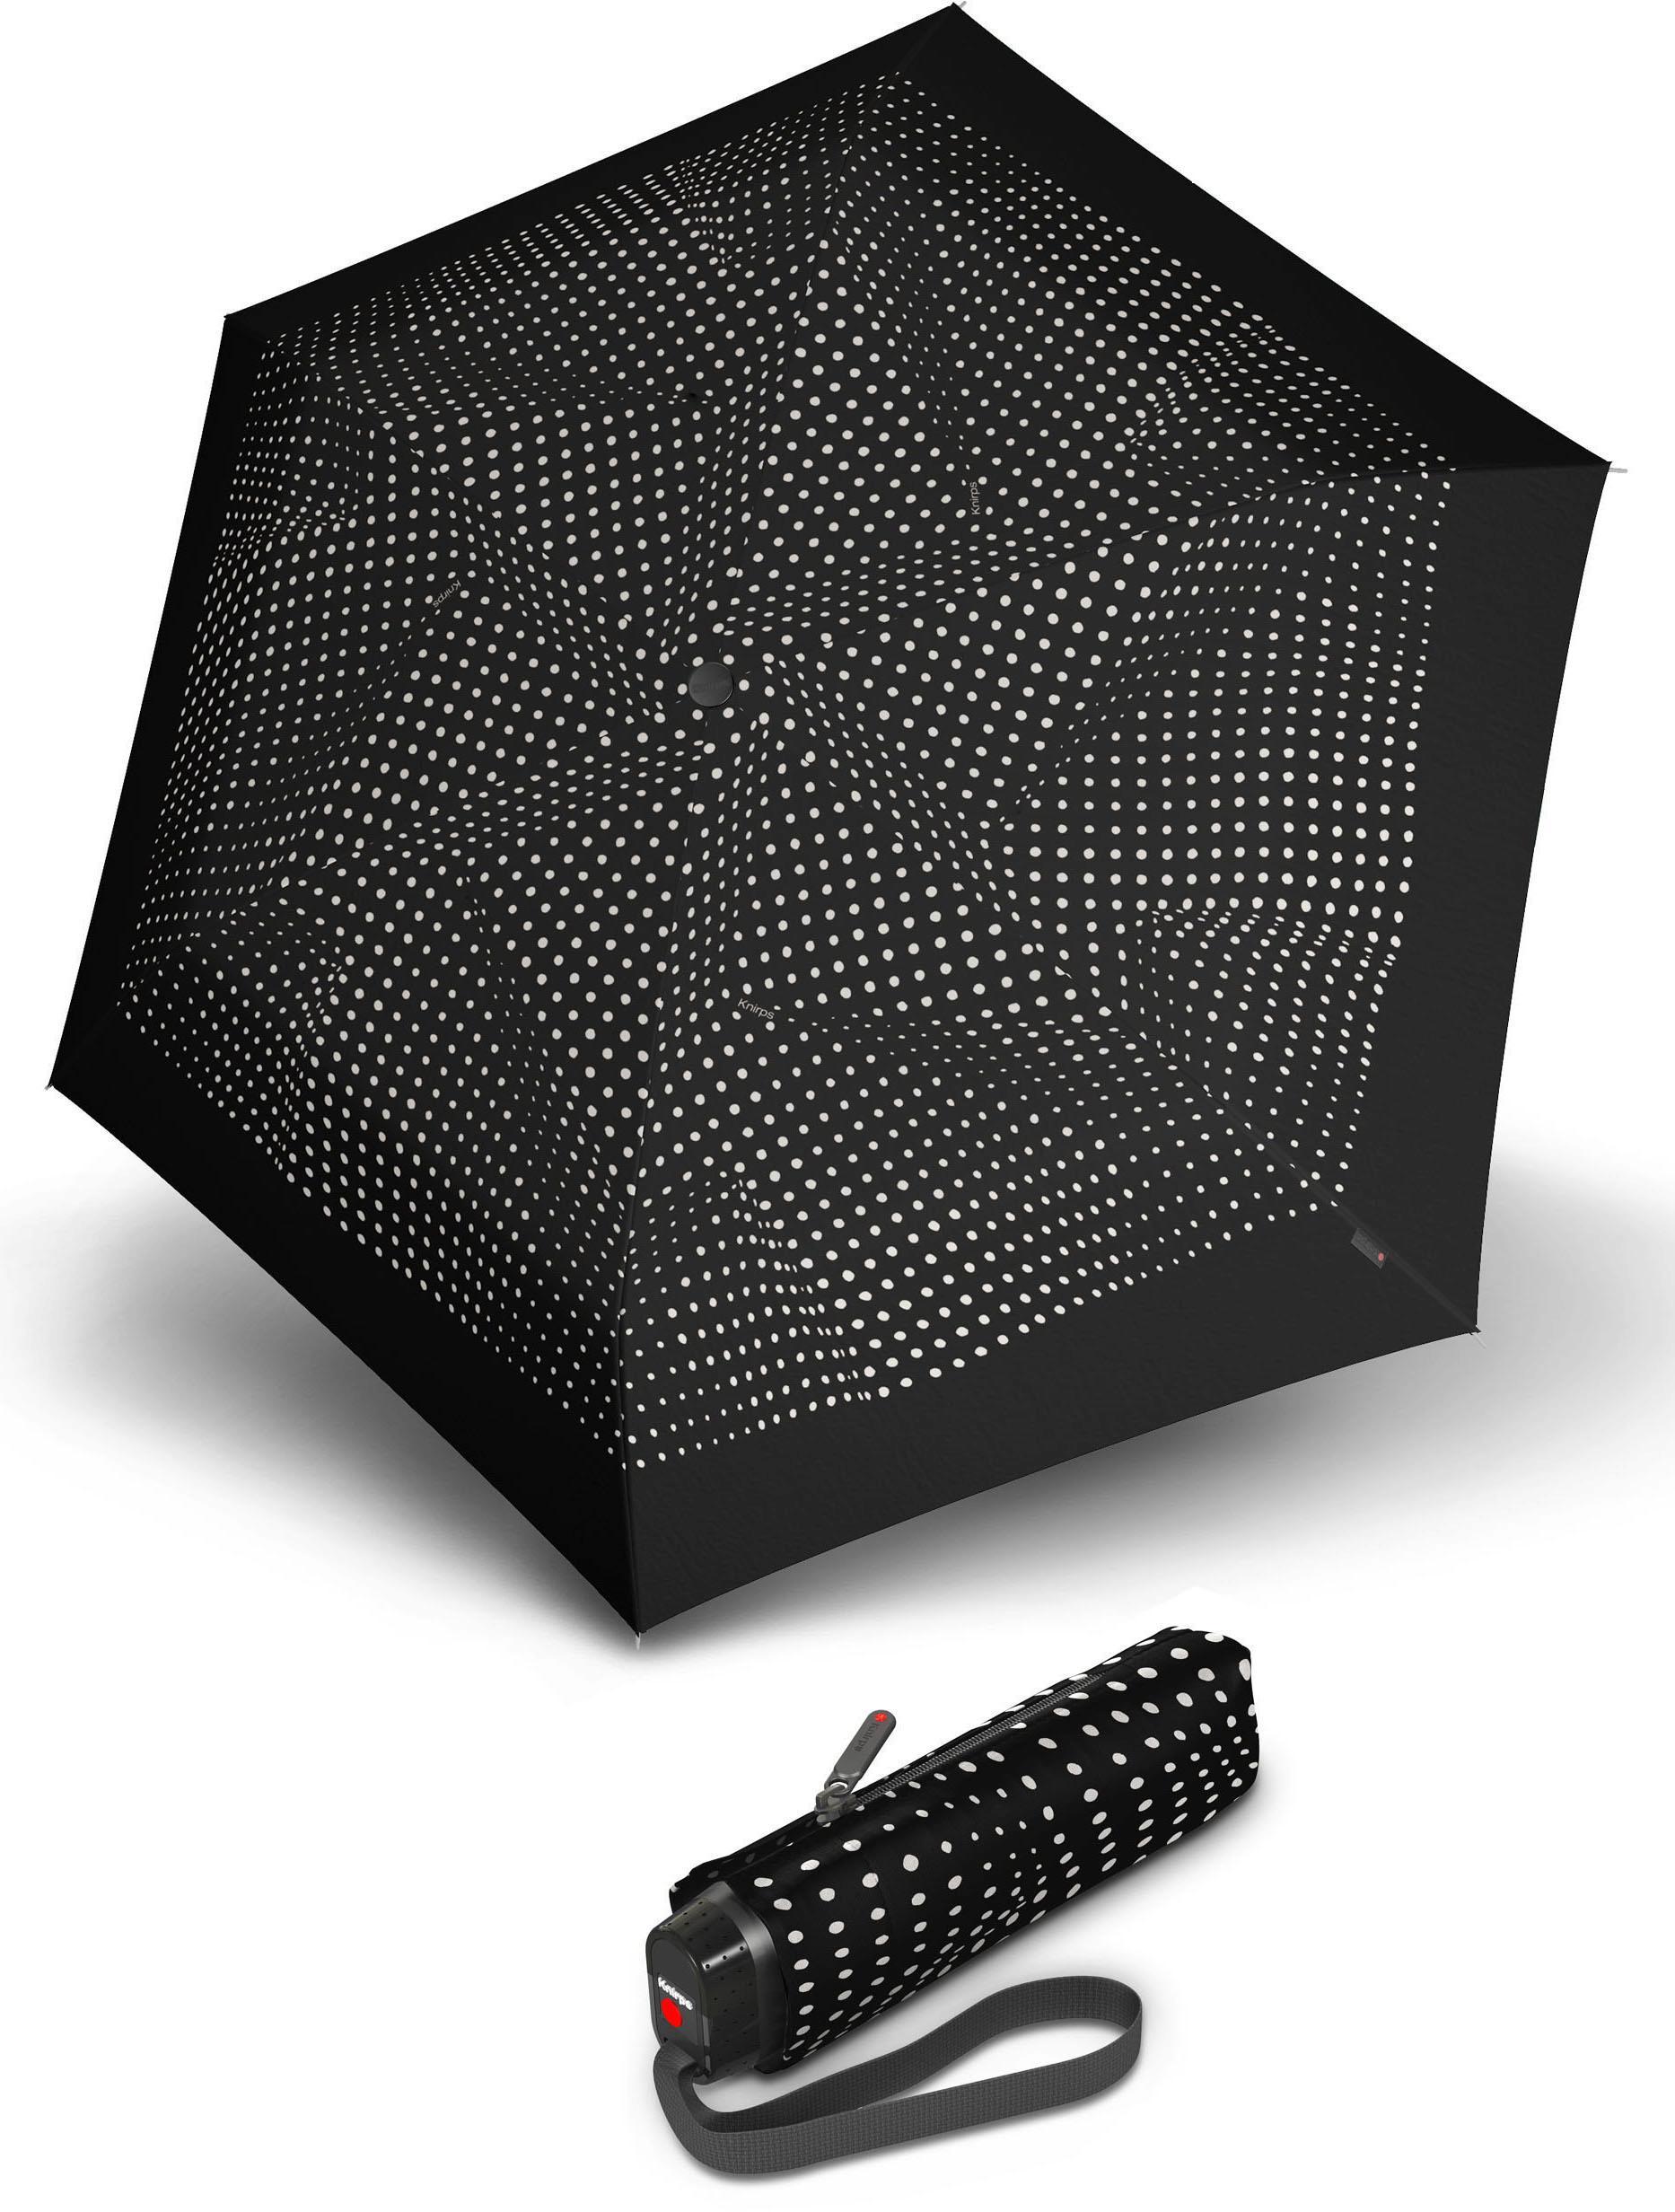 Knirps® Regenschirm - Taschenschirm, »TS.010 Slim Small Manual bolero black/ecru« | Accessoires > Regenschirme | Schwarz | KNIRPS